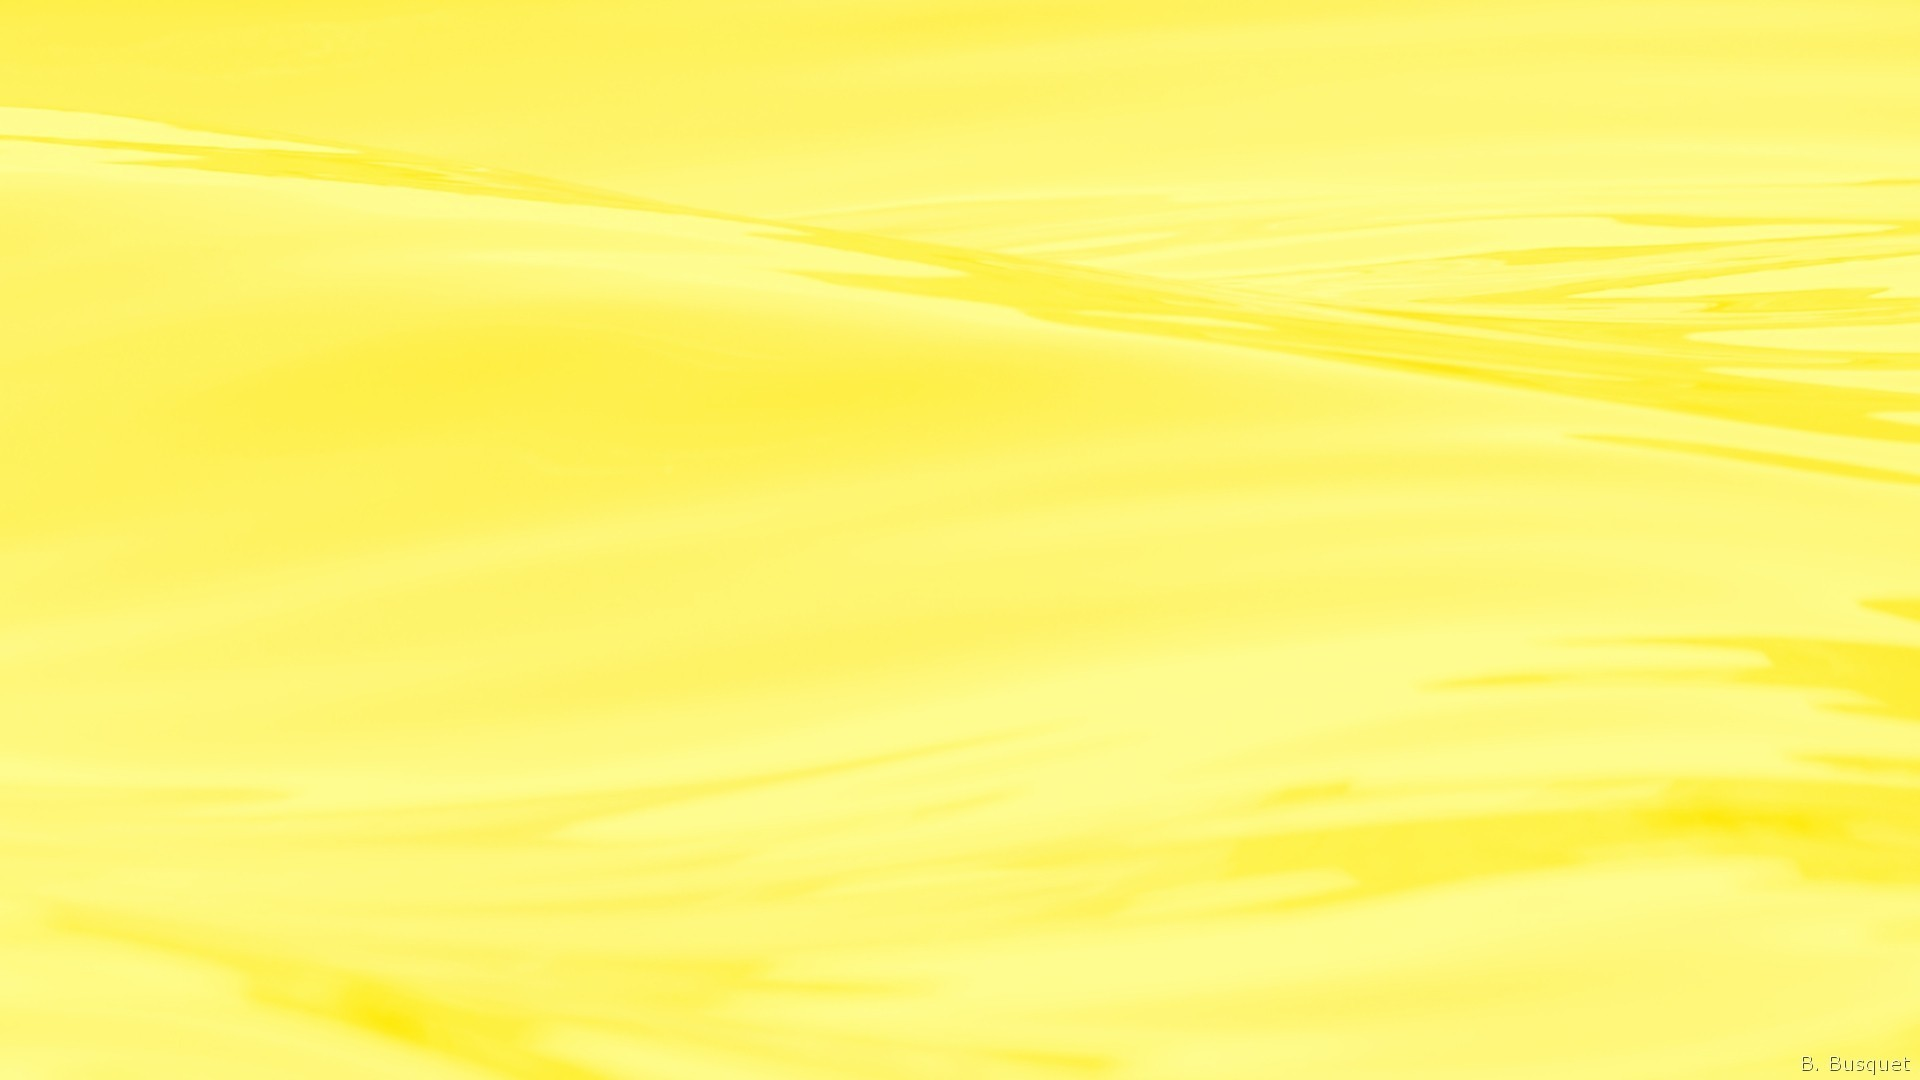 Wallpaper Light Yellow - Aesthetic Yellow Background Hd ...